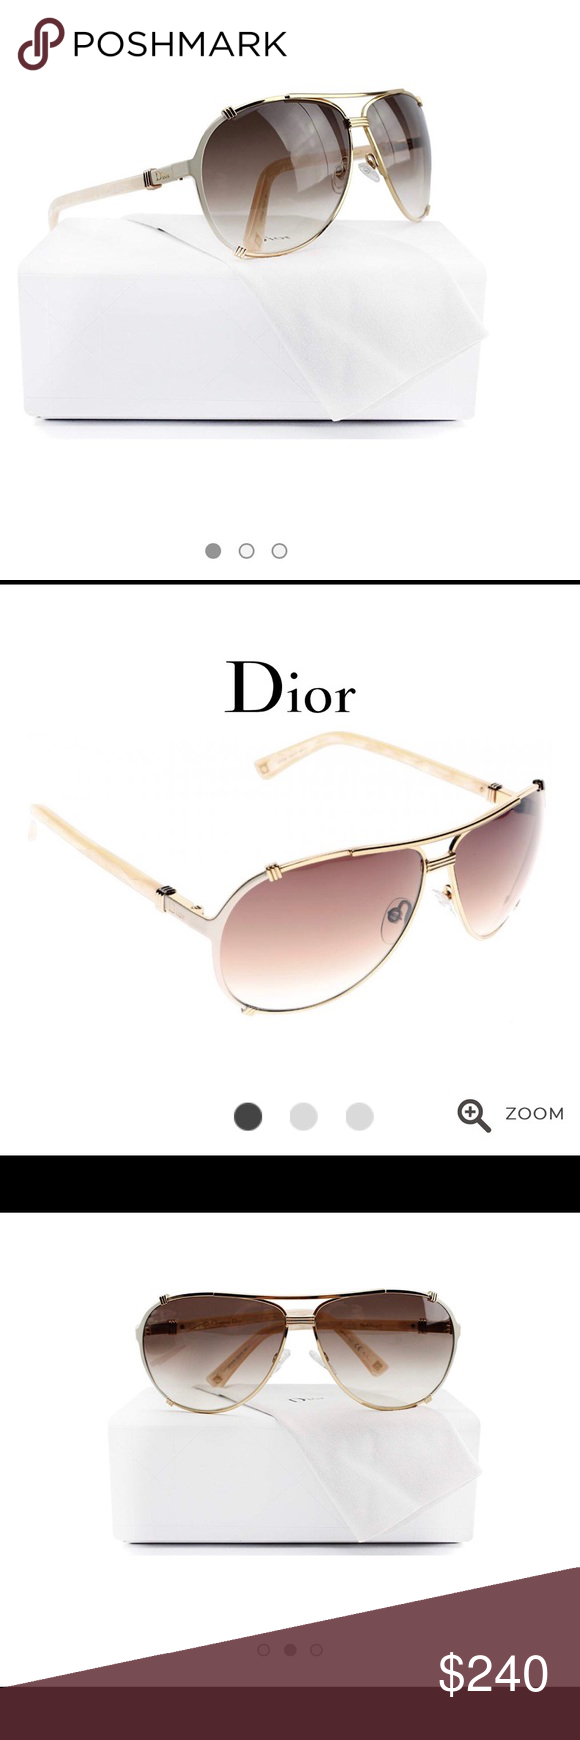 4080c9d5d9ac ✨Dior Chicago 2 aviator Sunglasses🌟 Christian Dior Chicago 2  Sunglasses  Rose Gold Cream Pink w Brown Violet Gradient (0UPU) UPU FM 63mm.